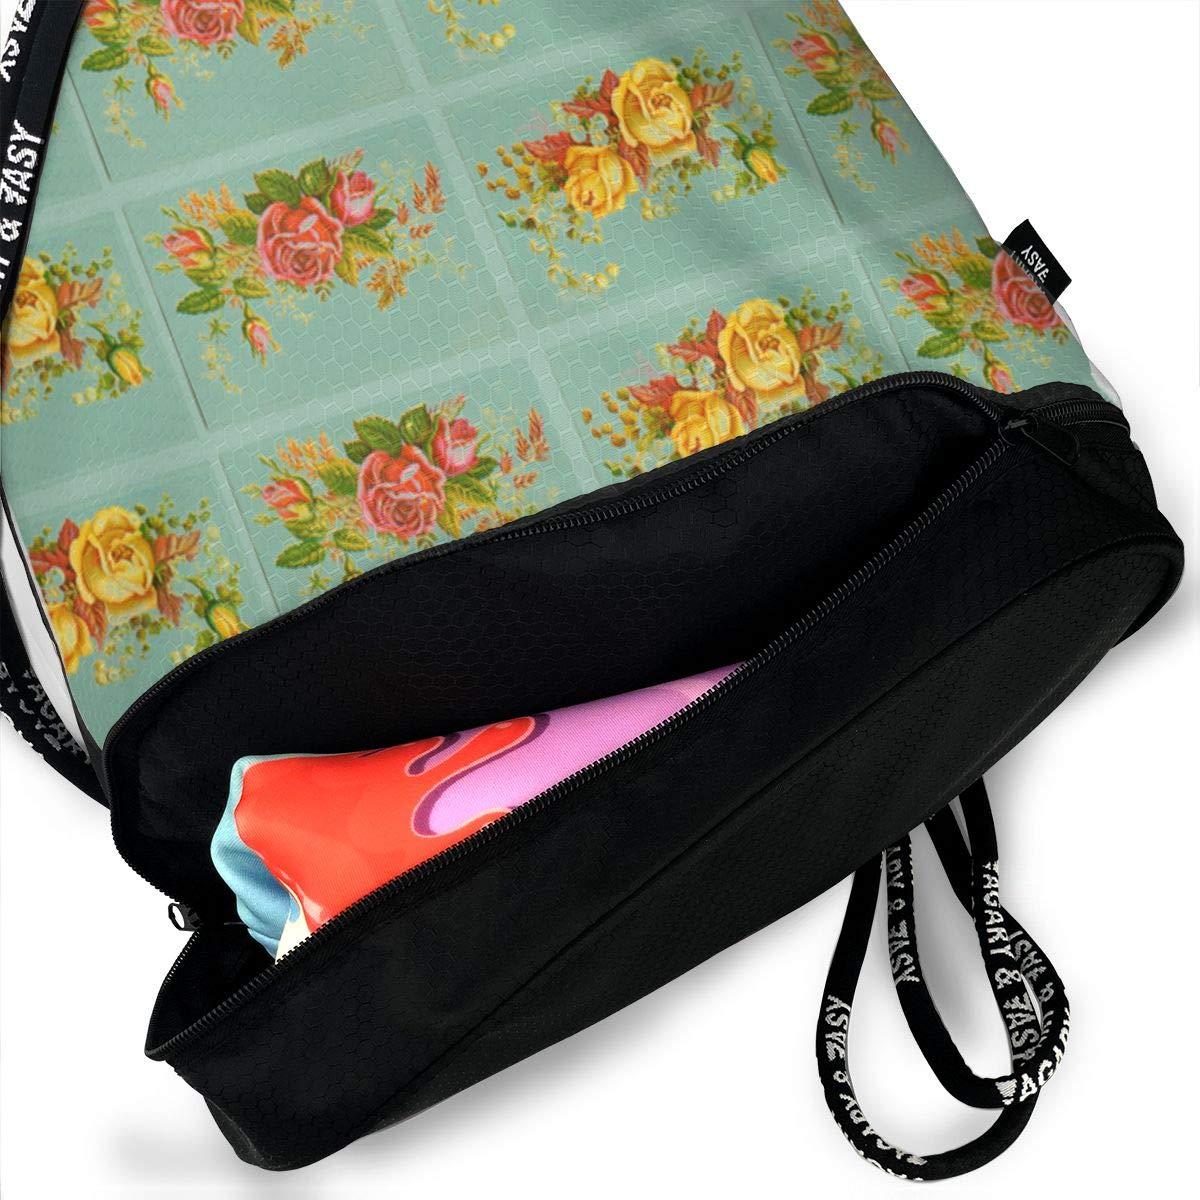 Retro Flower Drawstring Backpack Sports Athletic Gym Cinch Sack String Storage Bags for Hiking Travel Beach